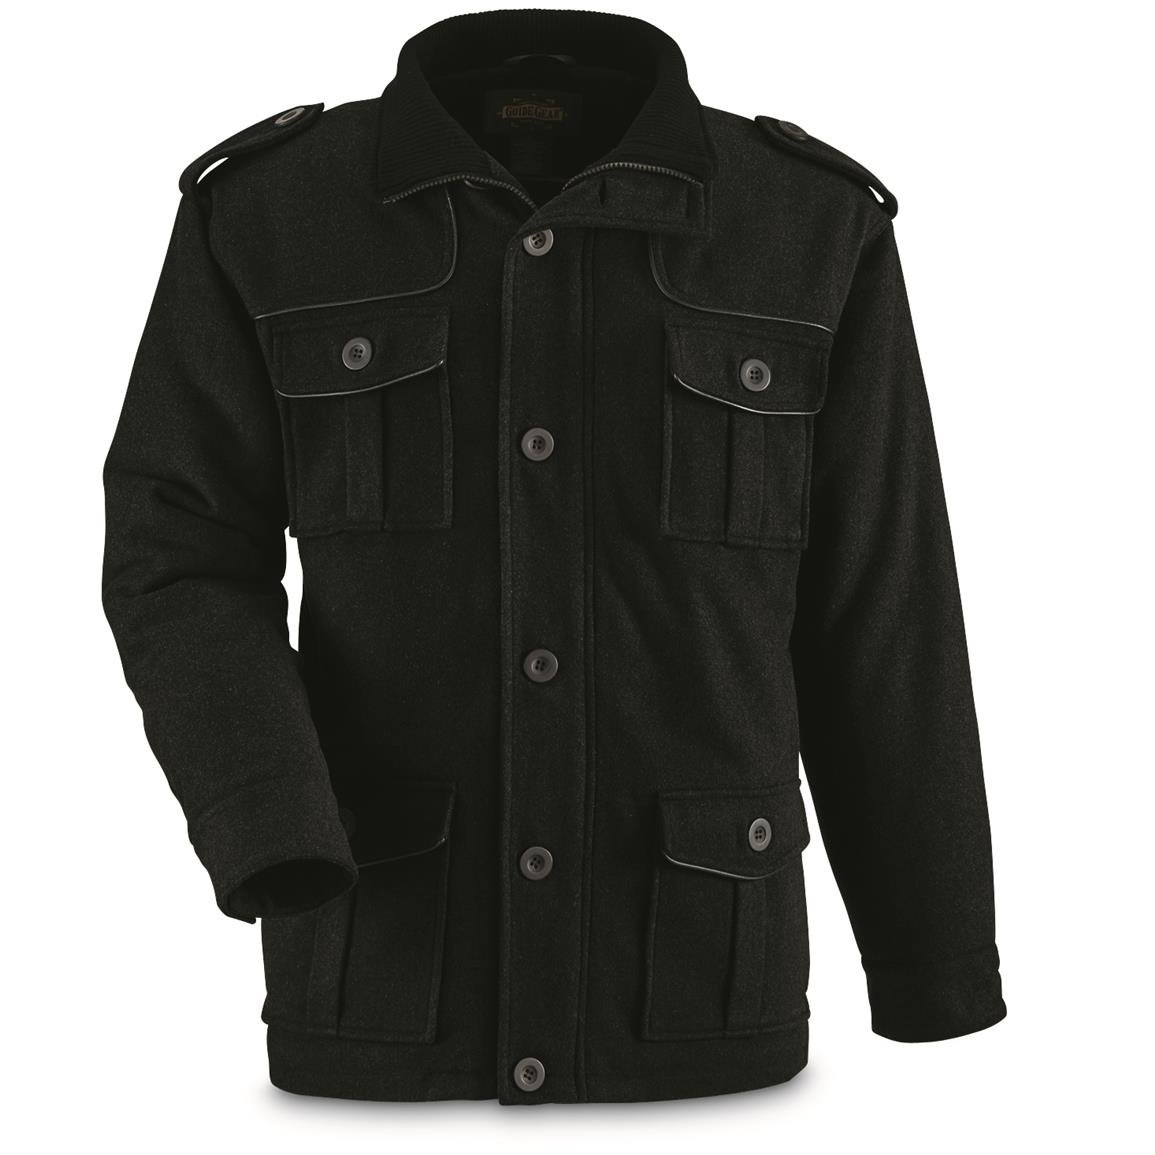 guide gear menu0027s military style jacket, black nscfkjx